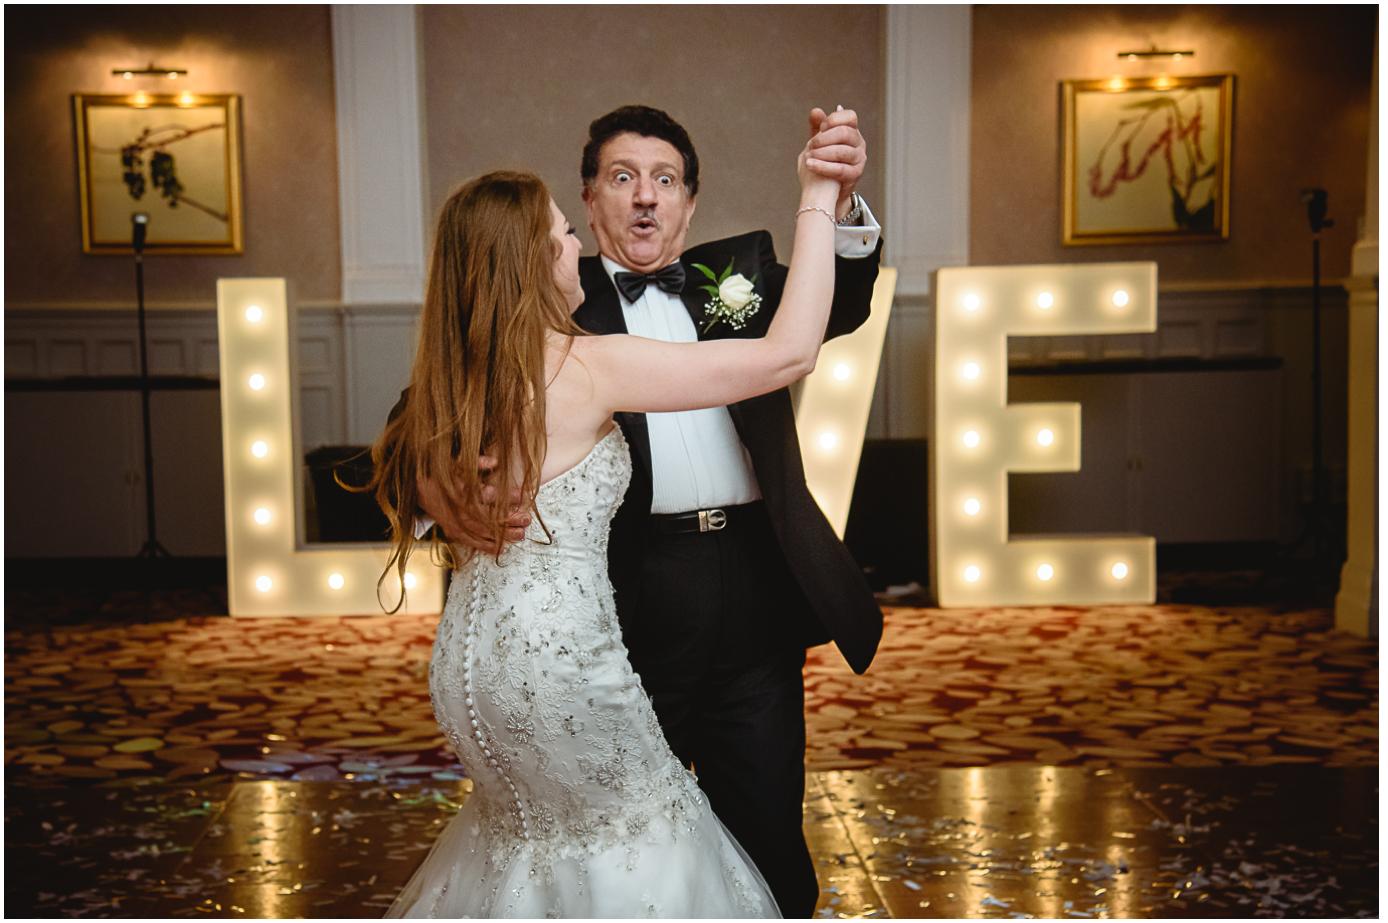 83 - Esmat and Angus - St. Ermin's Hotel London wedding photographer